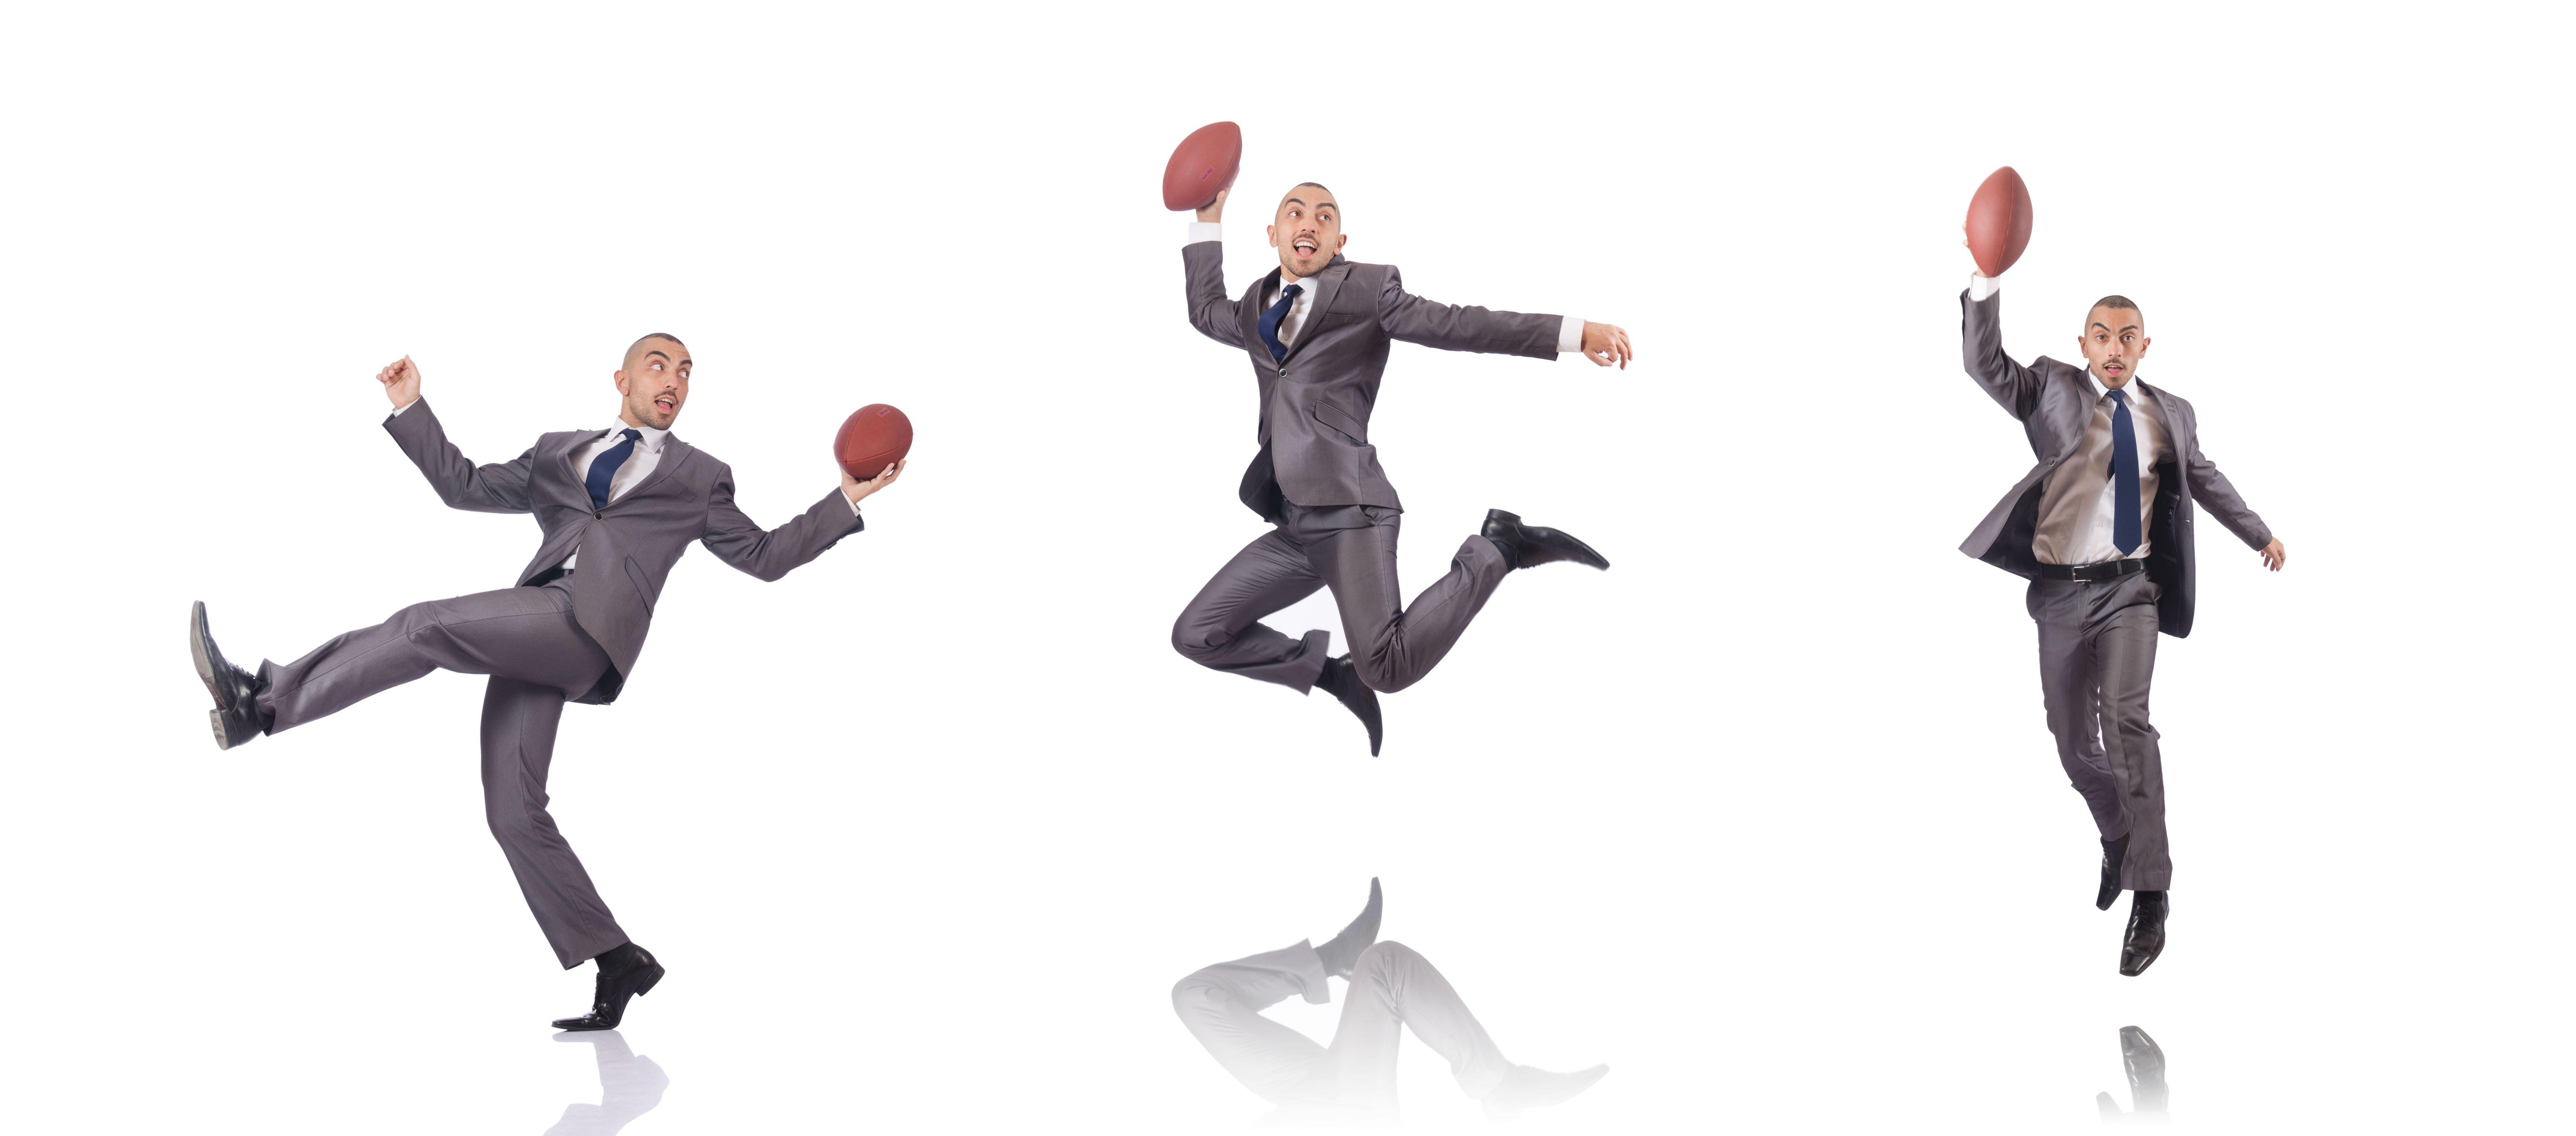 BD Blog Post Image #1 (Businessman with Football) (1)